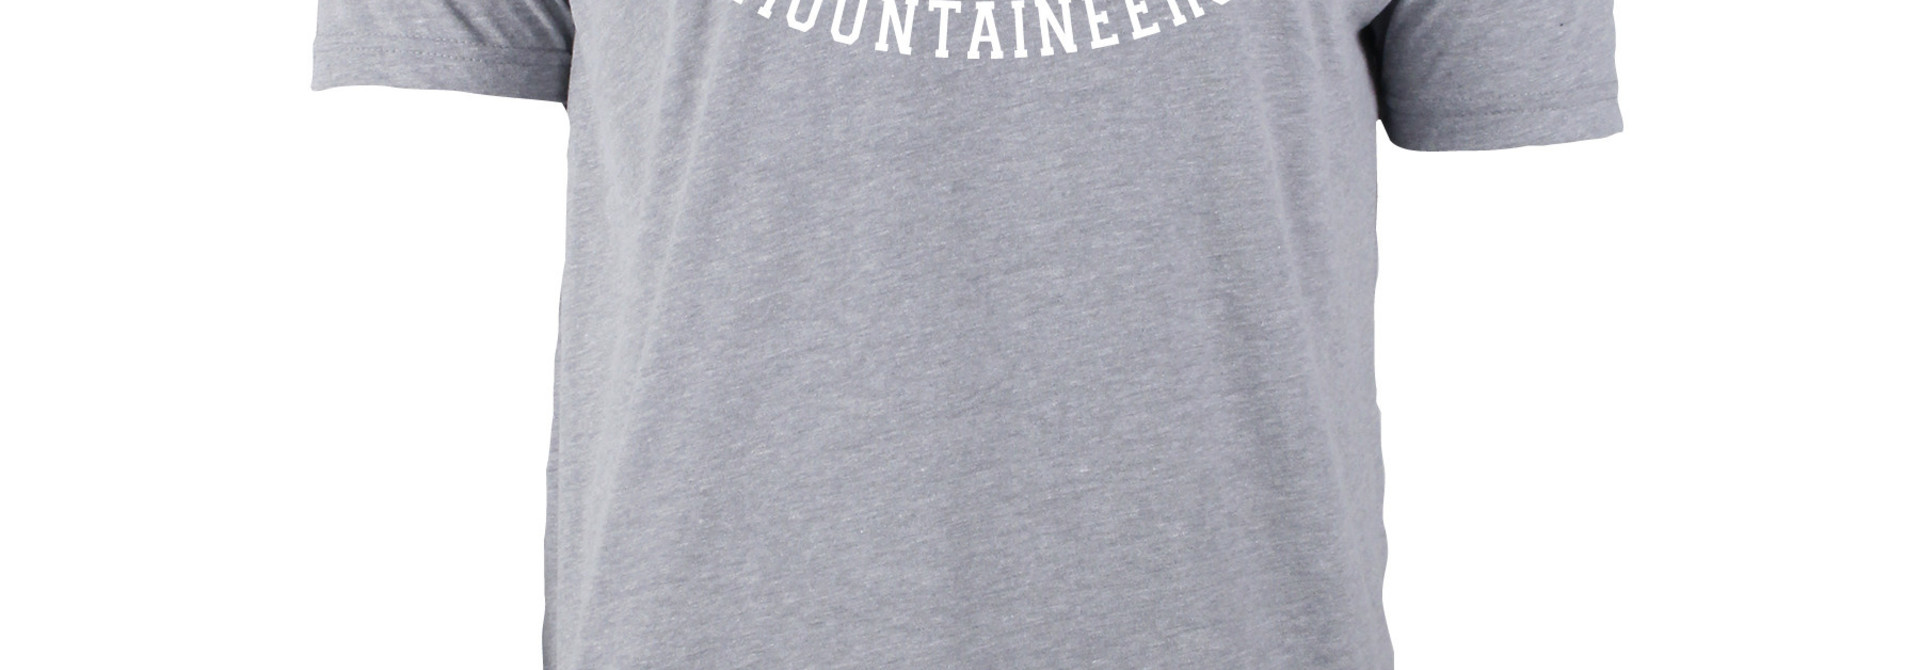 Short Sleeve T-shirt Gray Heather